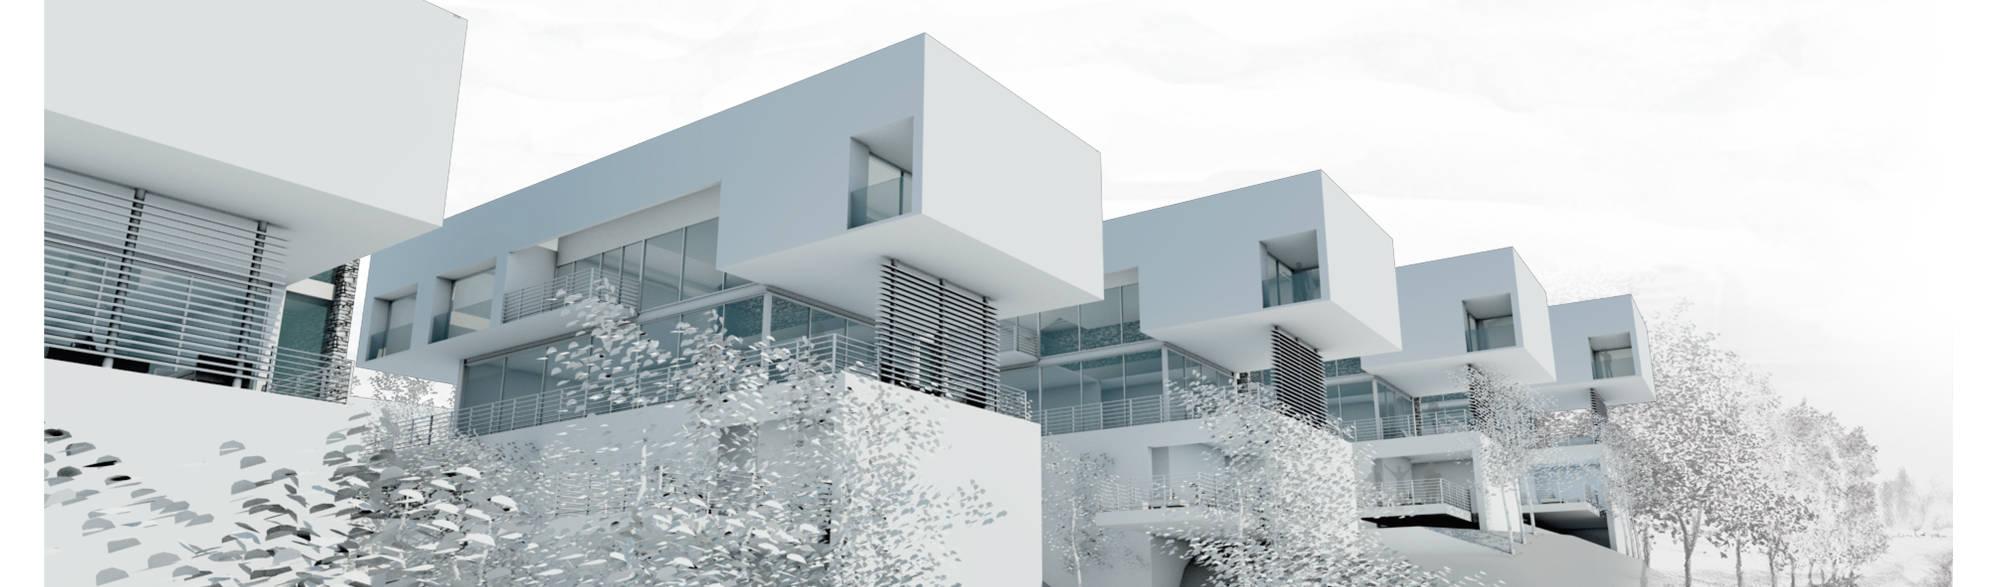 CH2 arquitectos